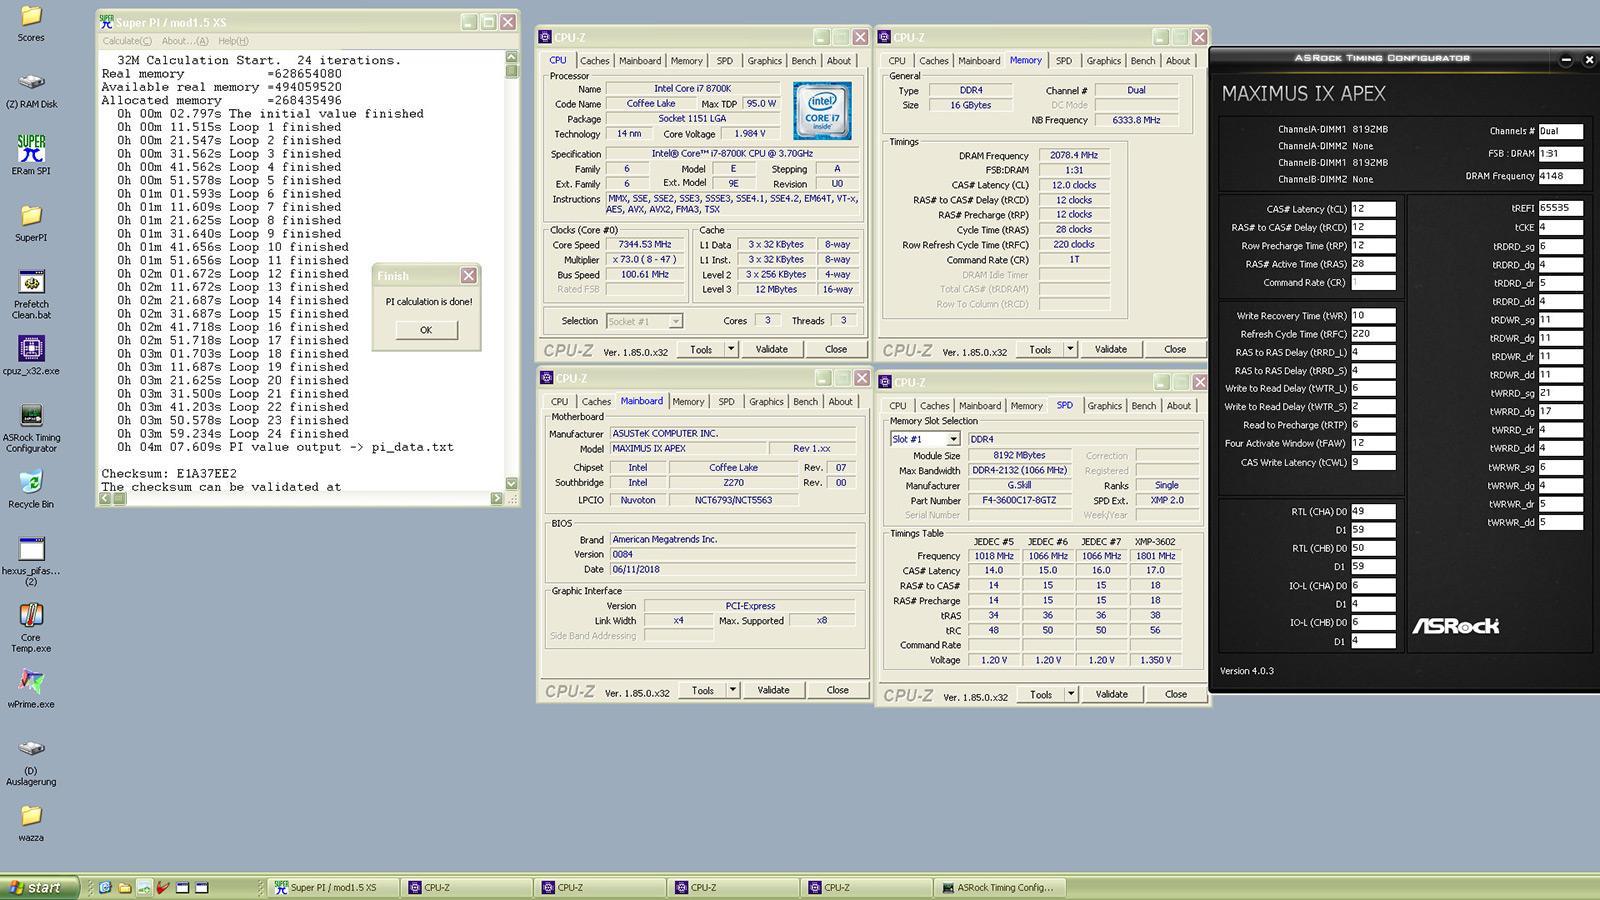 Core i7 8700K at 7.34 GHz on Z270 Chipset 2